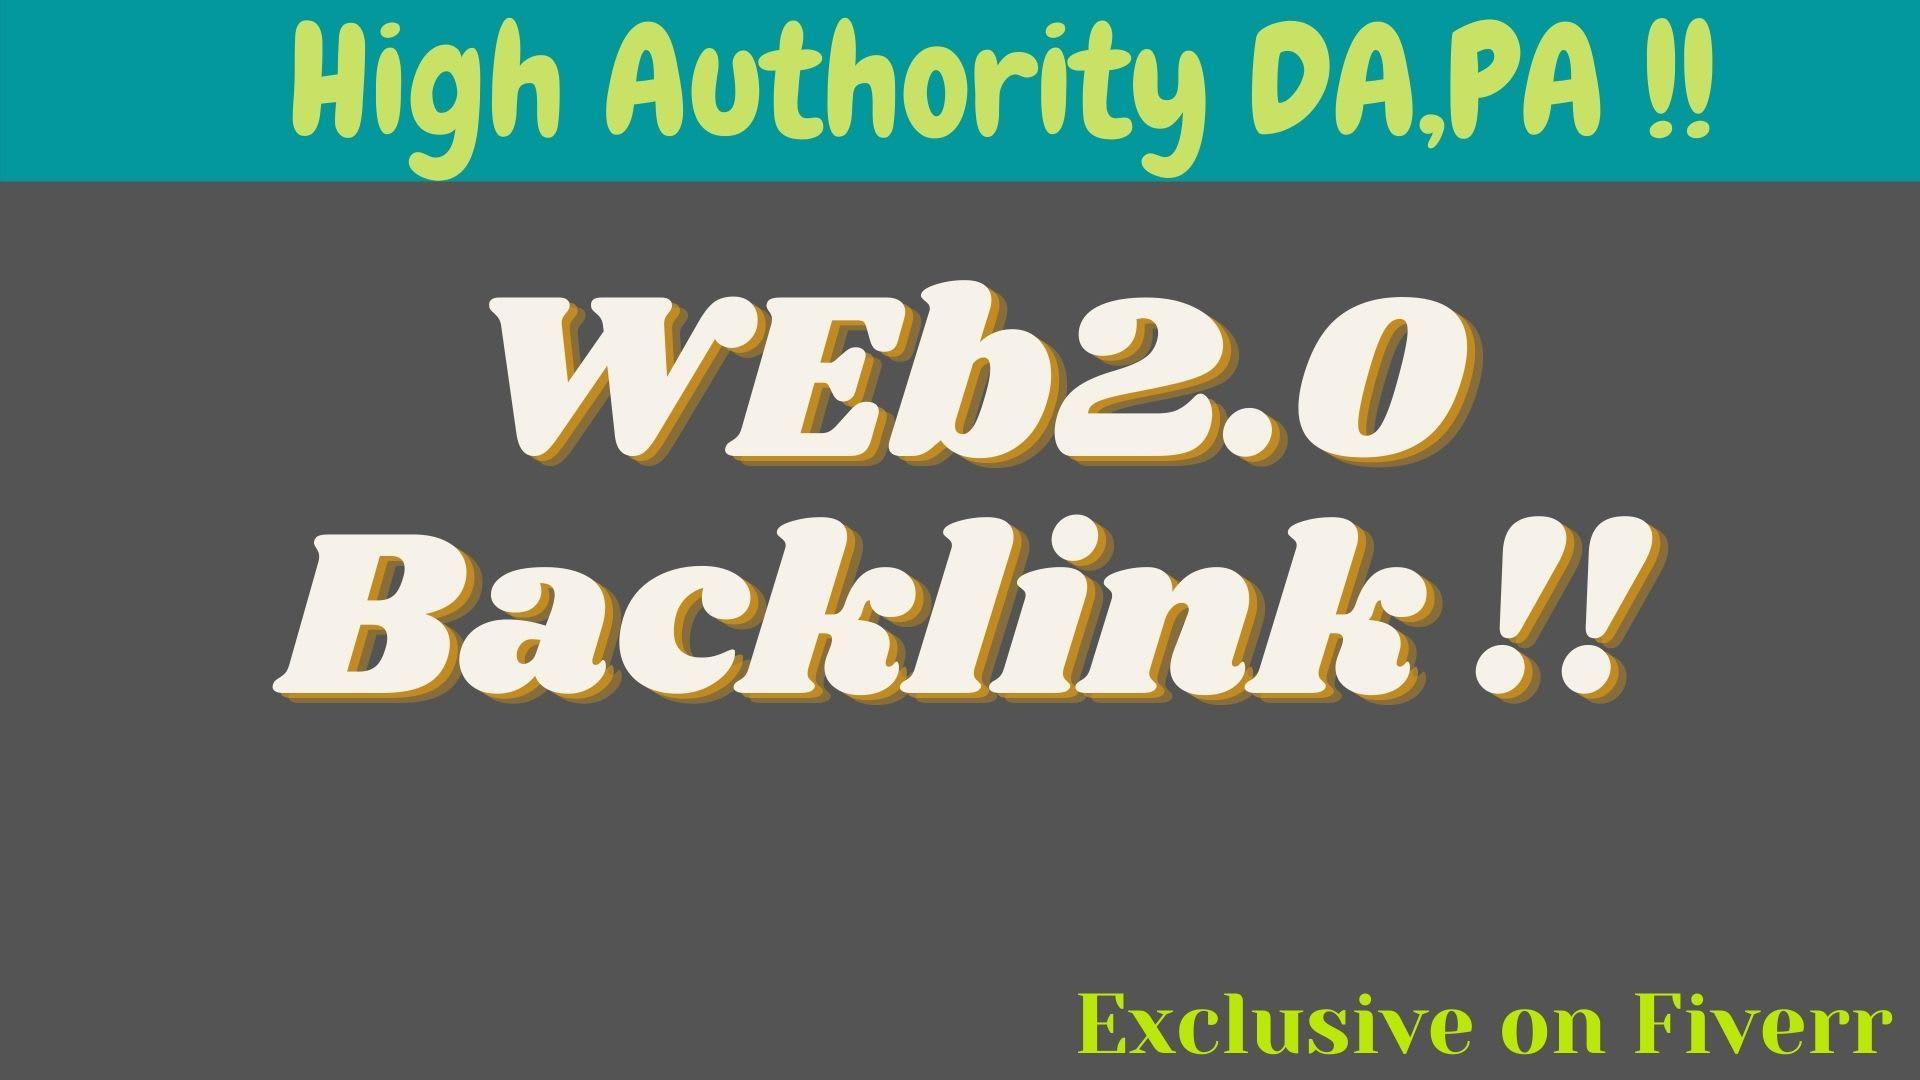 I will provide high quality web2 0 backlink